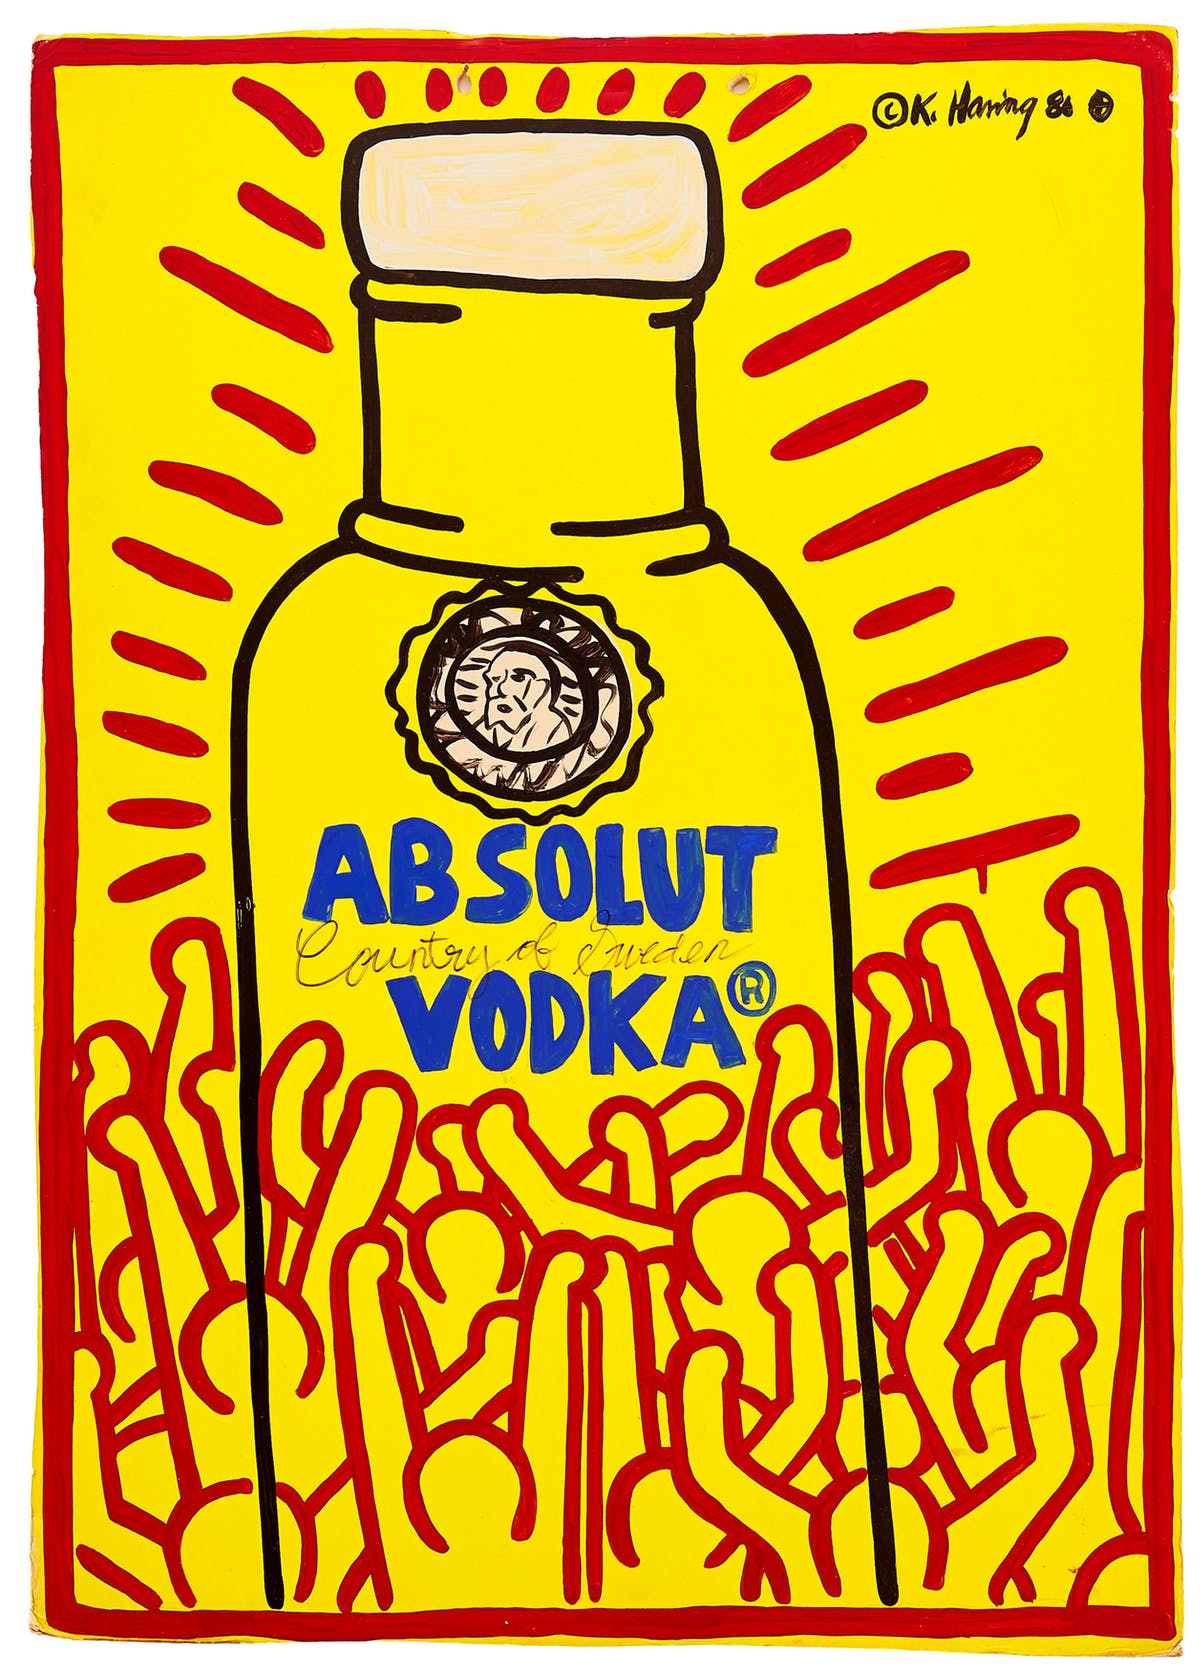 """Absolut Vodka"". Signed and dated © K. Haring 86. Bild Uppsala Auktionskammare"